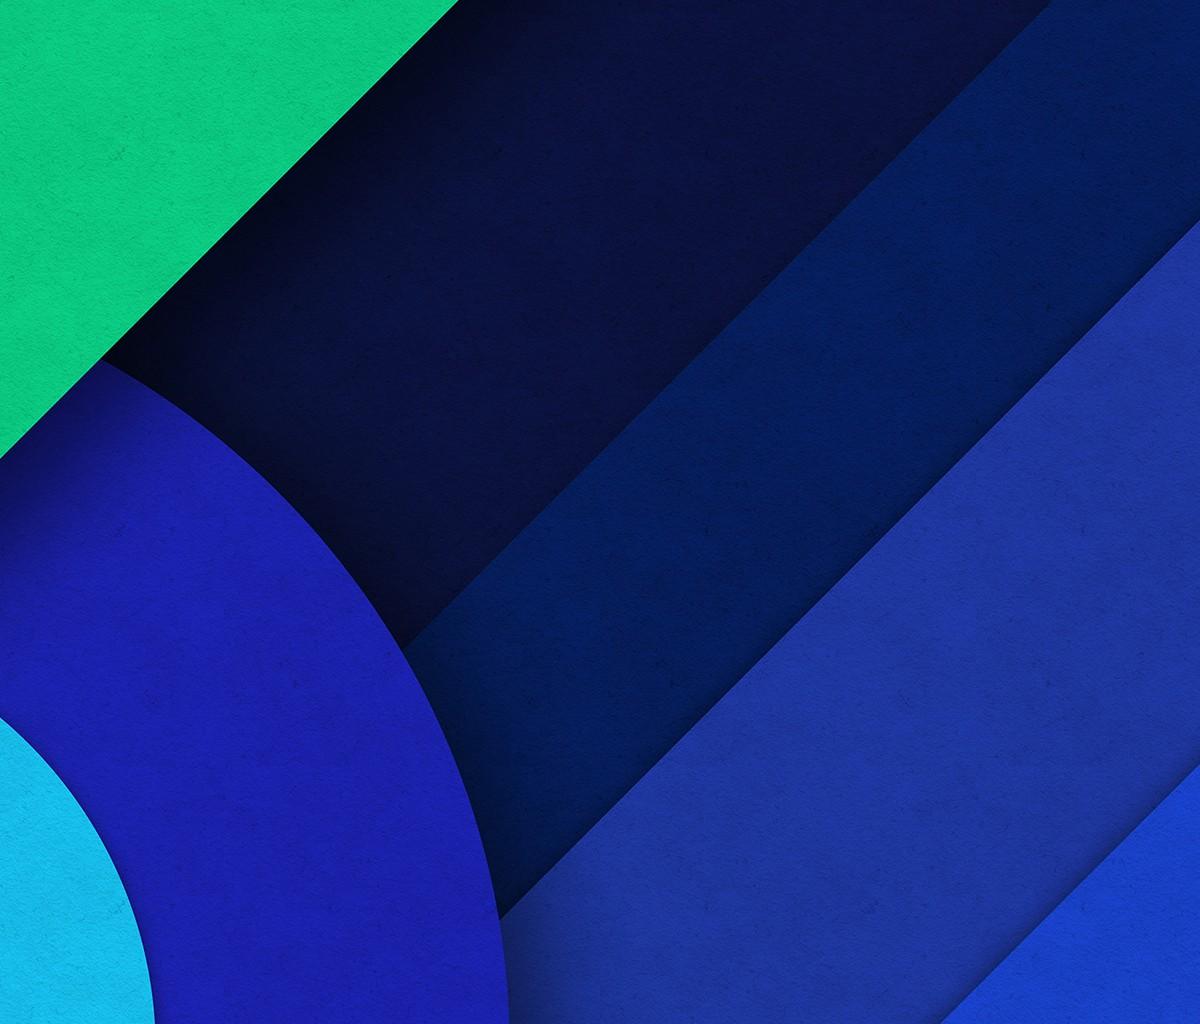 Alcatel Pixi 4 Stock Wallpapers: Alcatel Pixi 4 Stock Wallpaper 16